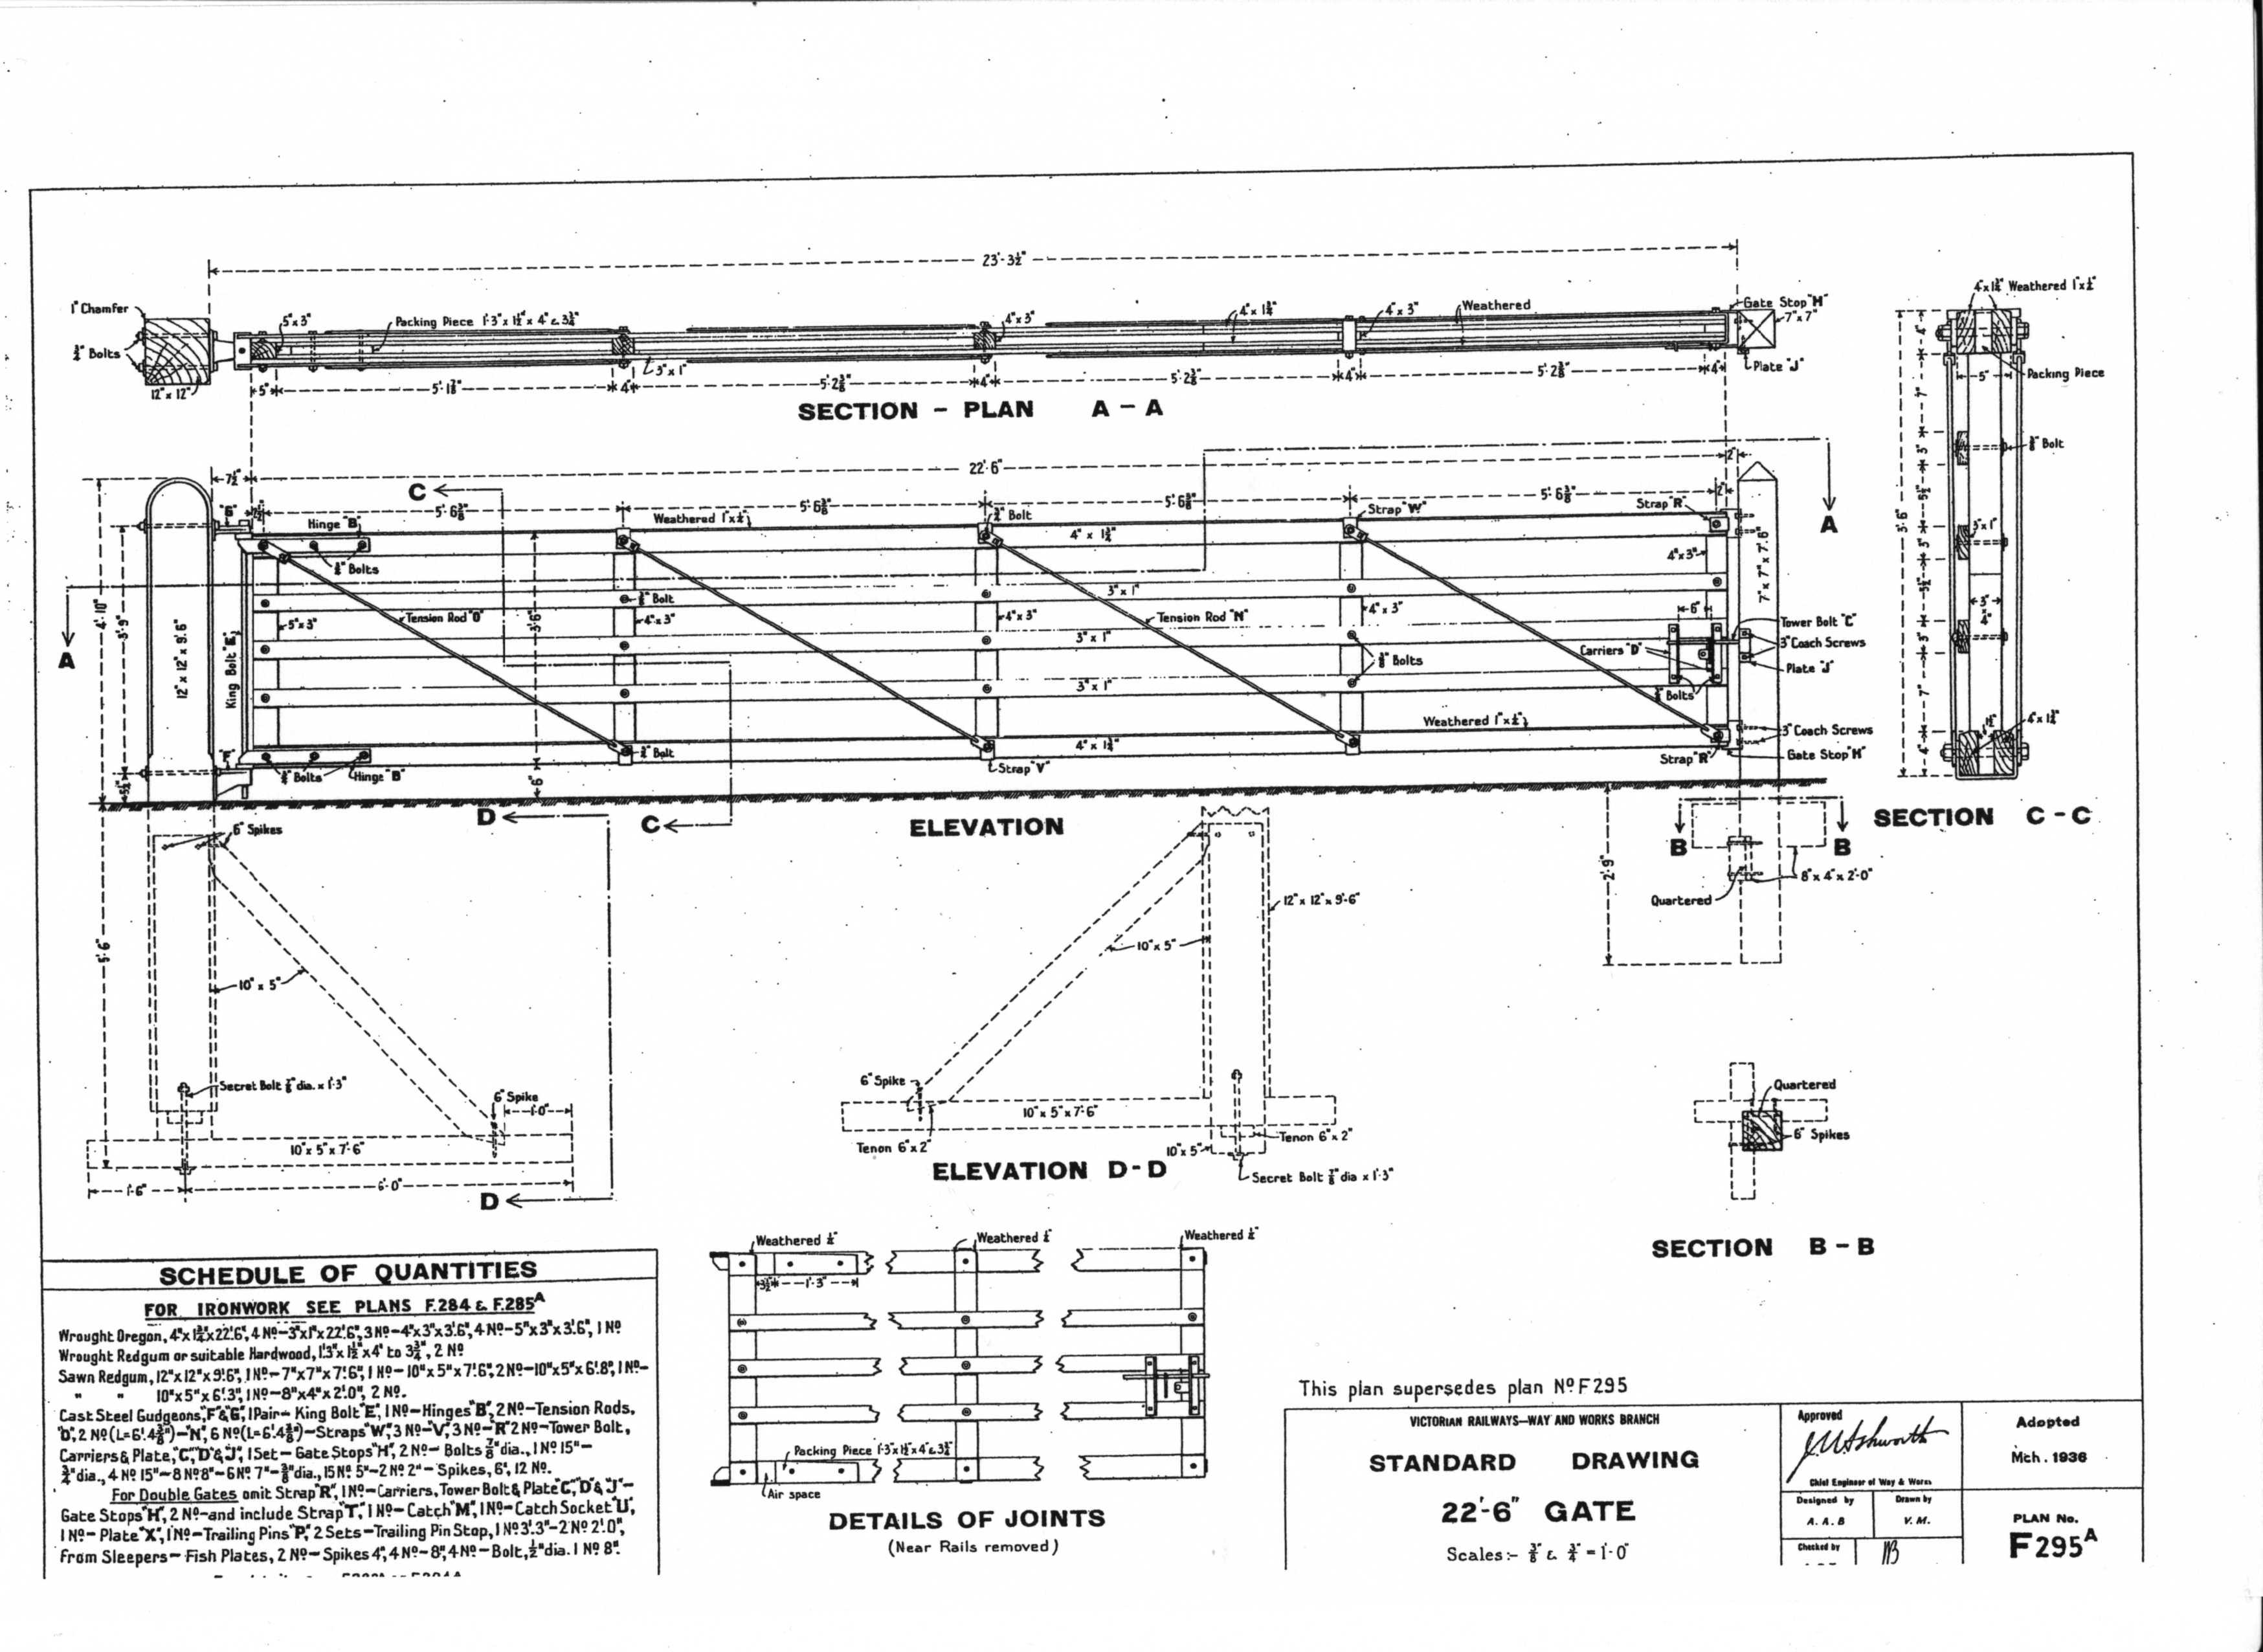 Infastructure Home Beam Bridge Diagram F 289 Bedplates For I Bridges 290 Timber Footbridge Details 291b Mould Concrete Tests 292b Pile Driving Plant 293a Markings